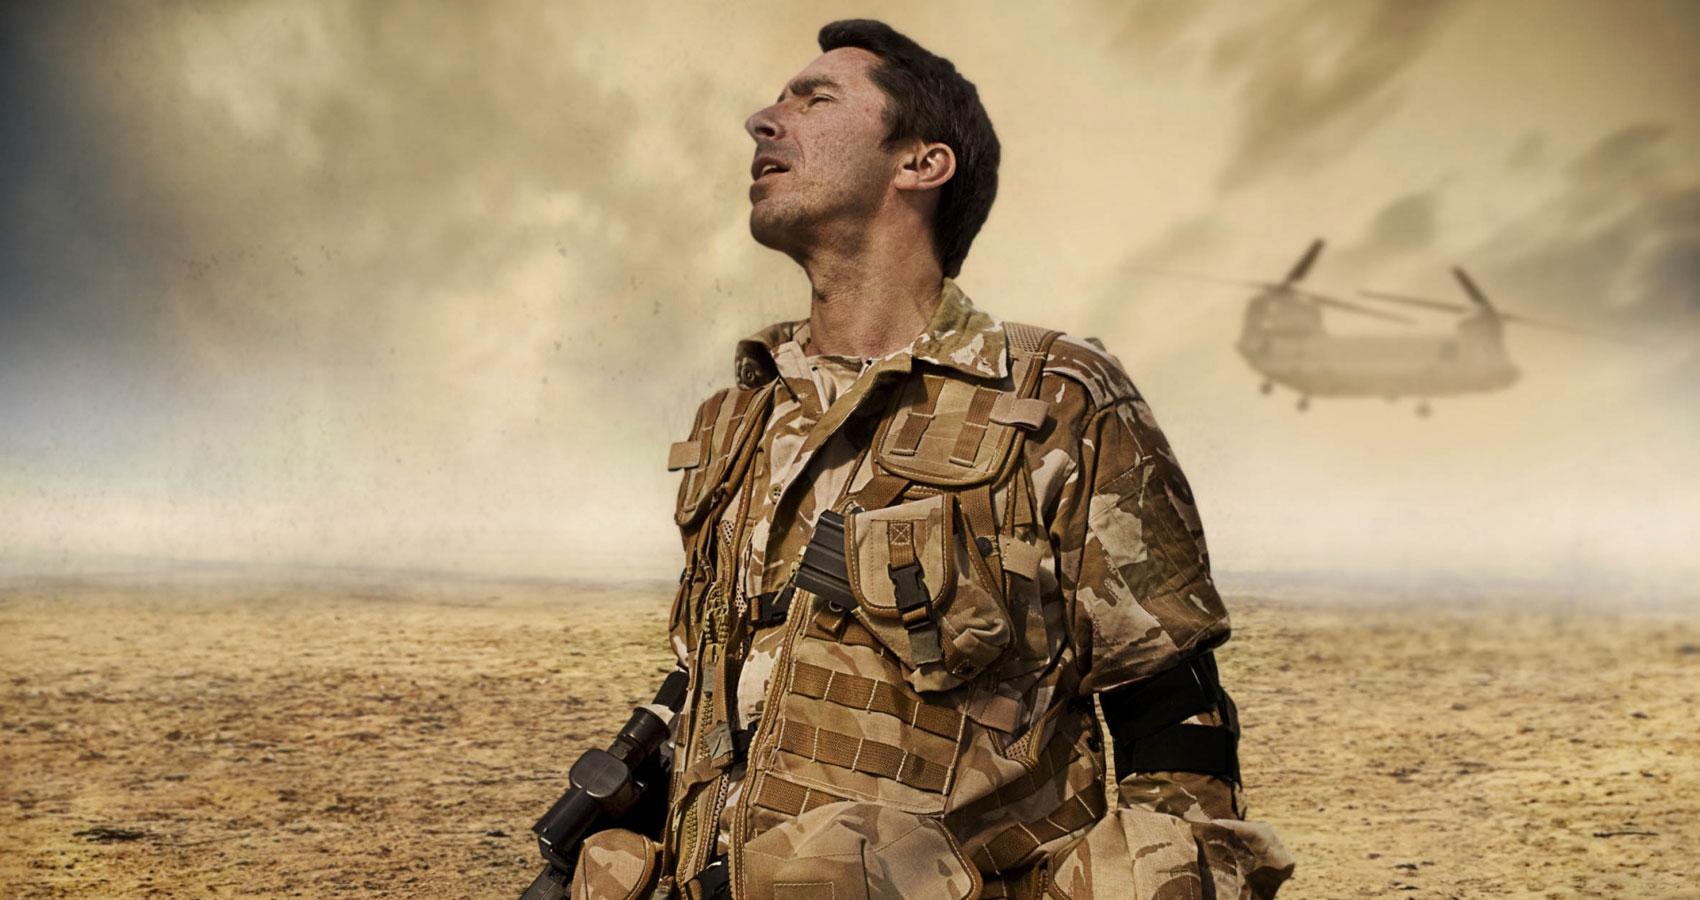 The Soldier written by Rupert Brooke at Spillwords.com